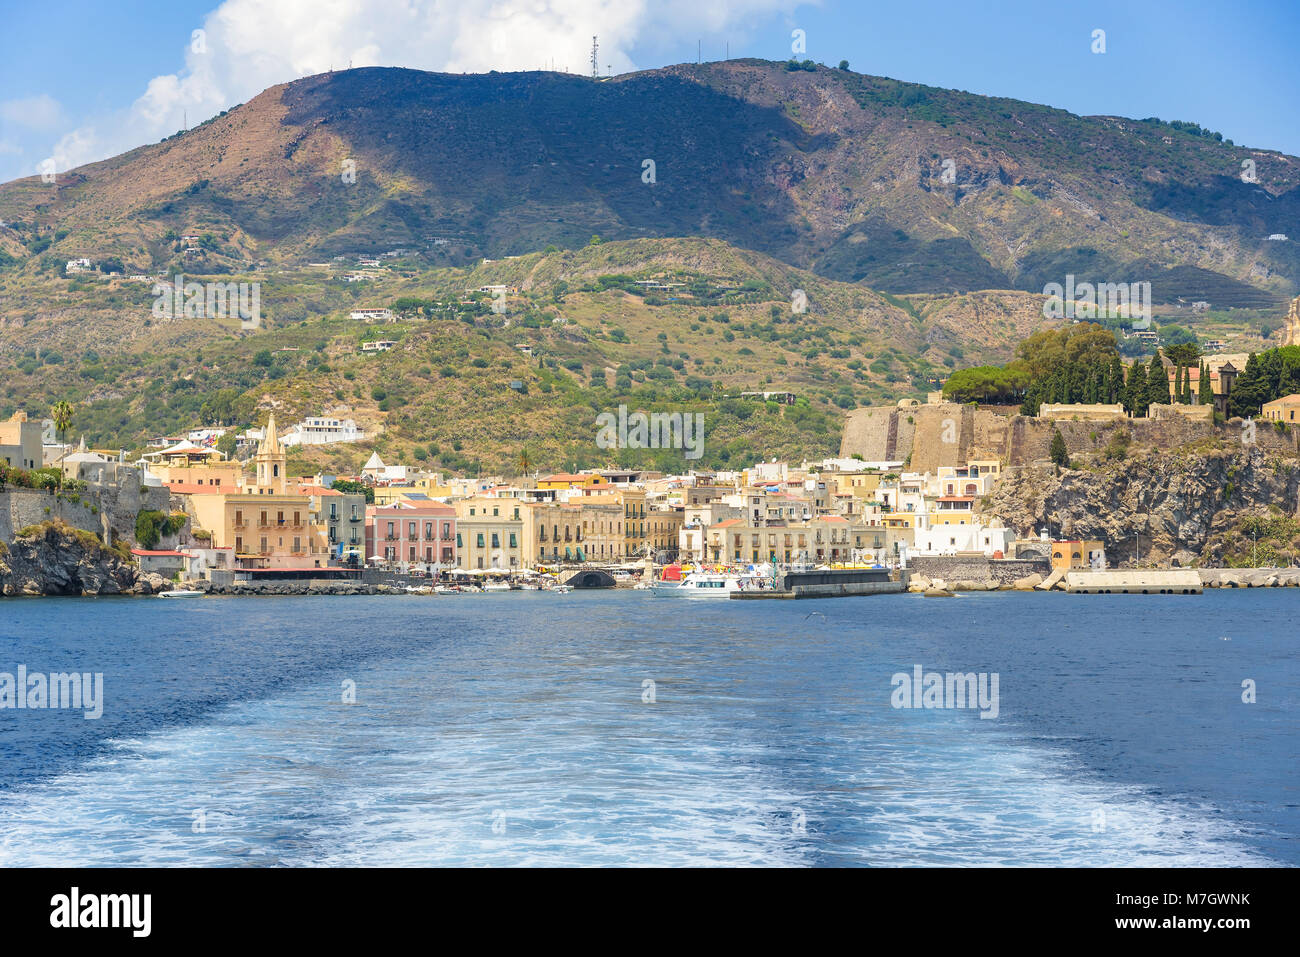 Lipari town seen from the sea, Aeolian Islands, Itay Stock Photo